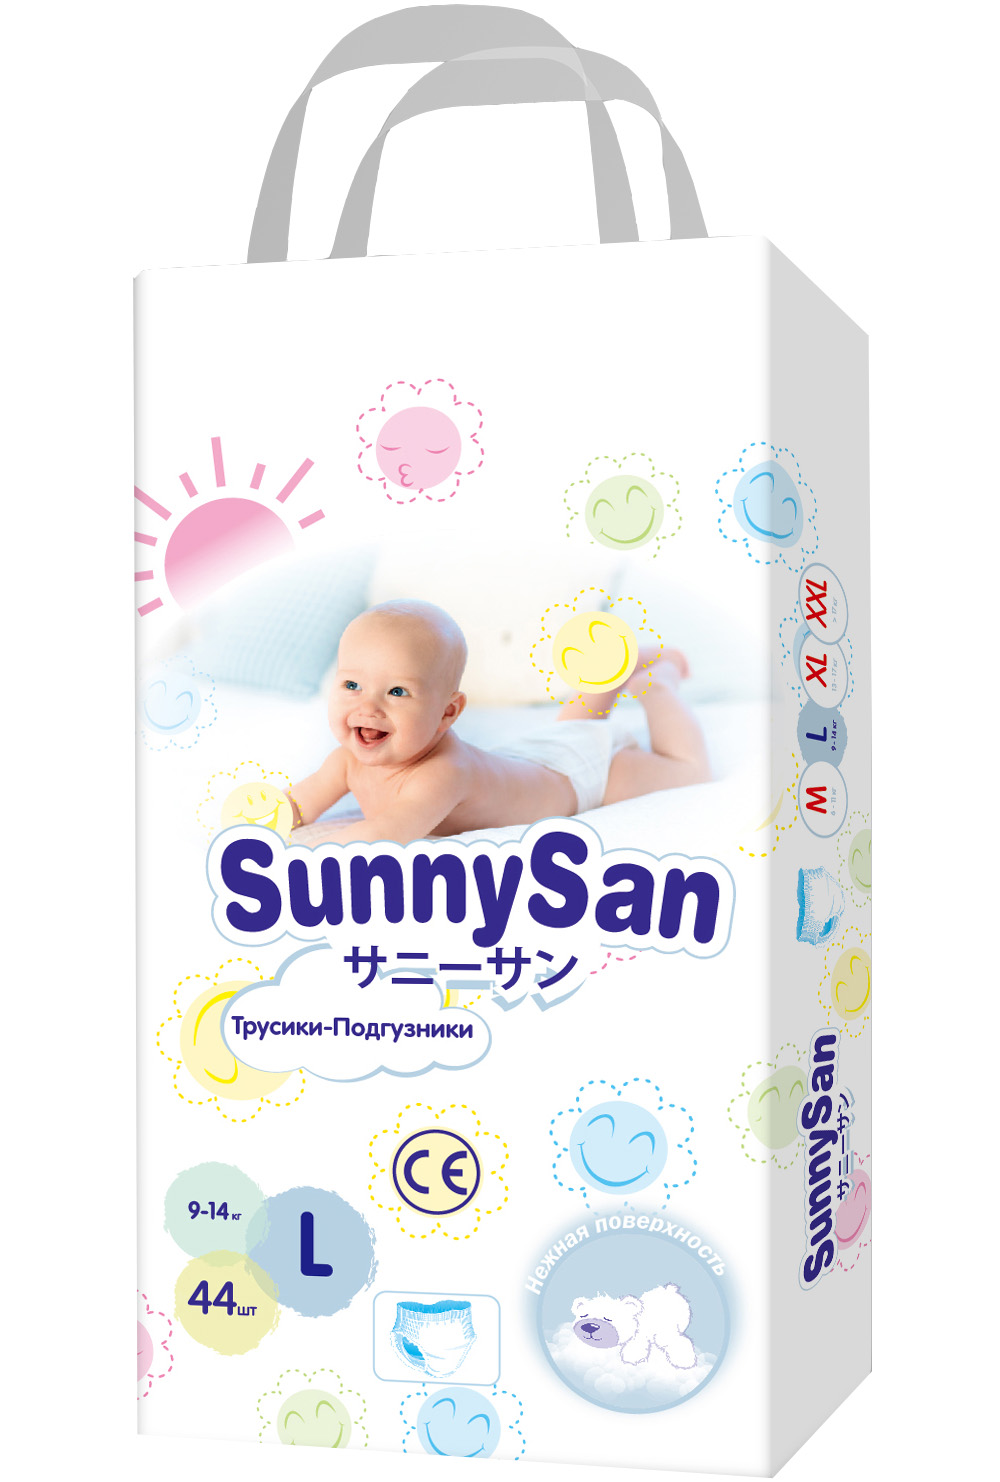 Трусики-подгузники SunnySan L 9-14 кг 44 шт.